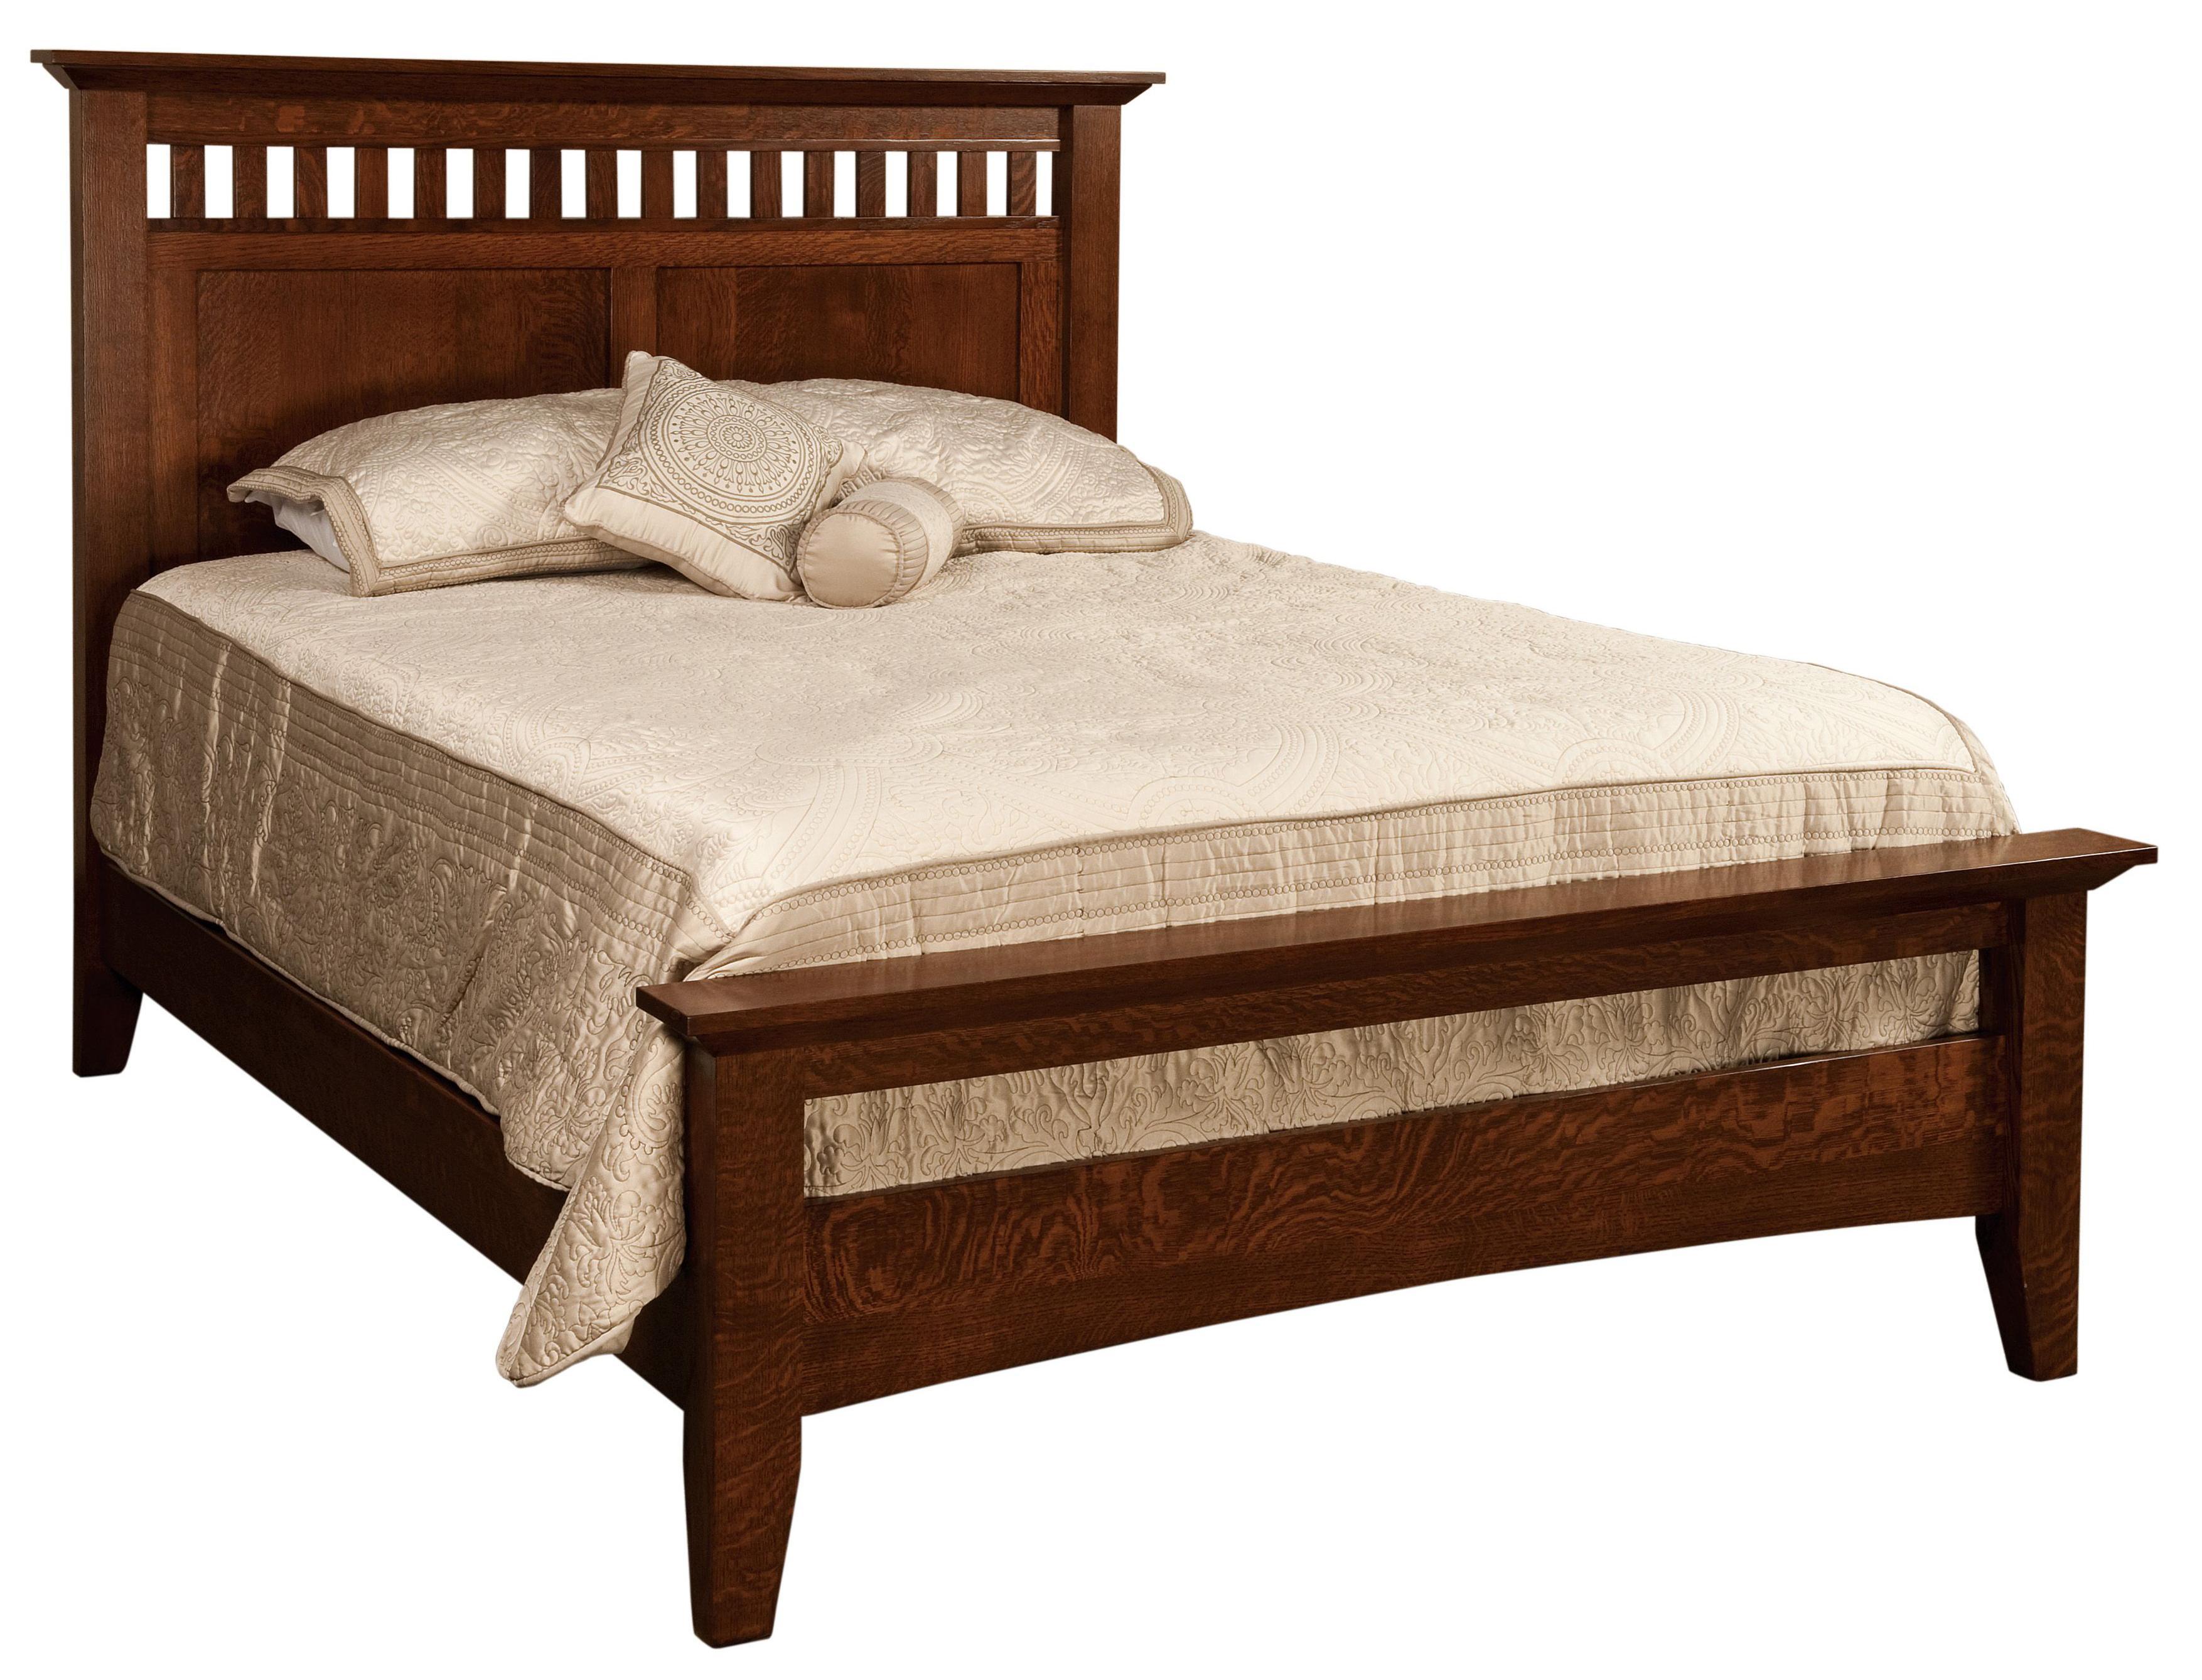 Morris Home Furnishings Savannah Savannah King Panel Bed - Item Number: SHKB-XX